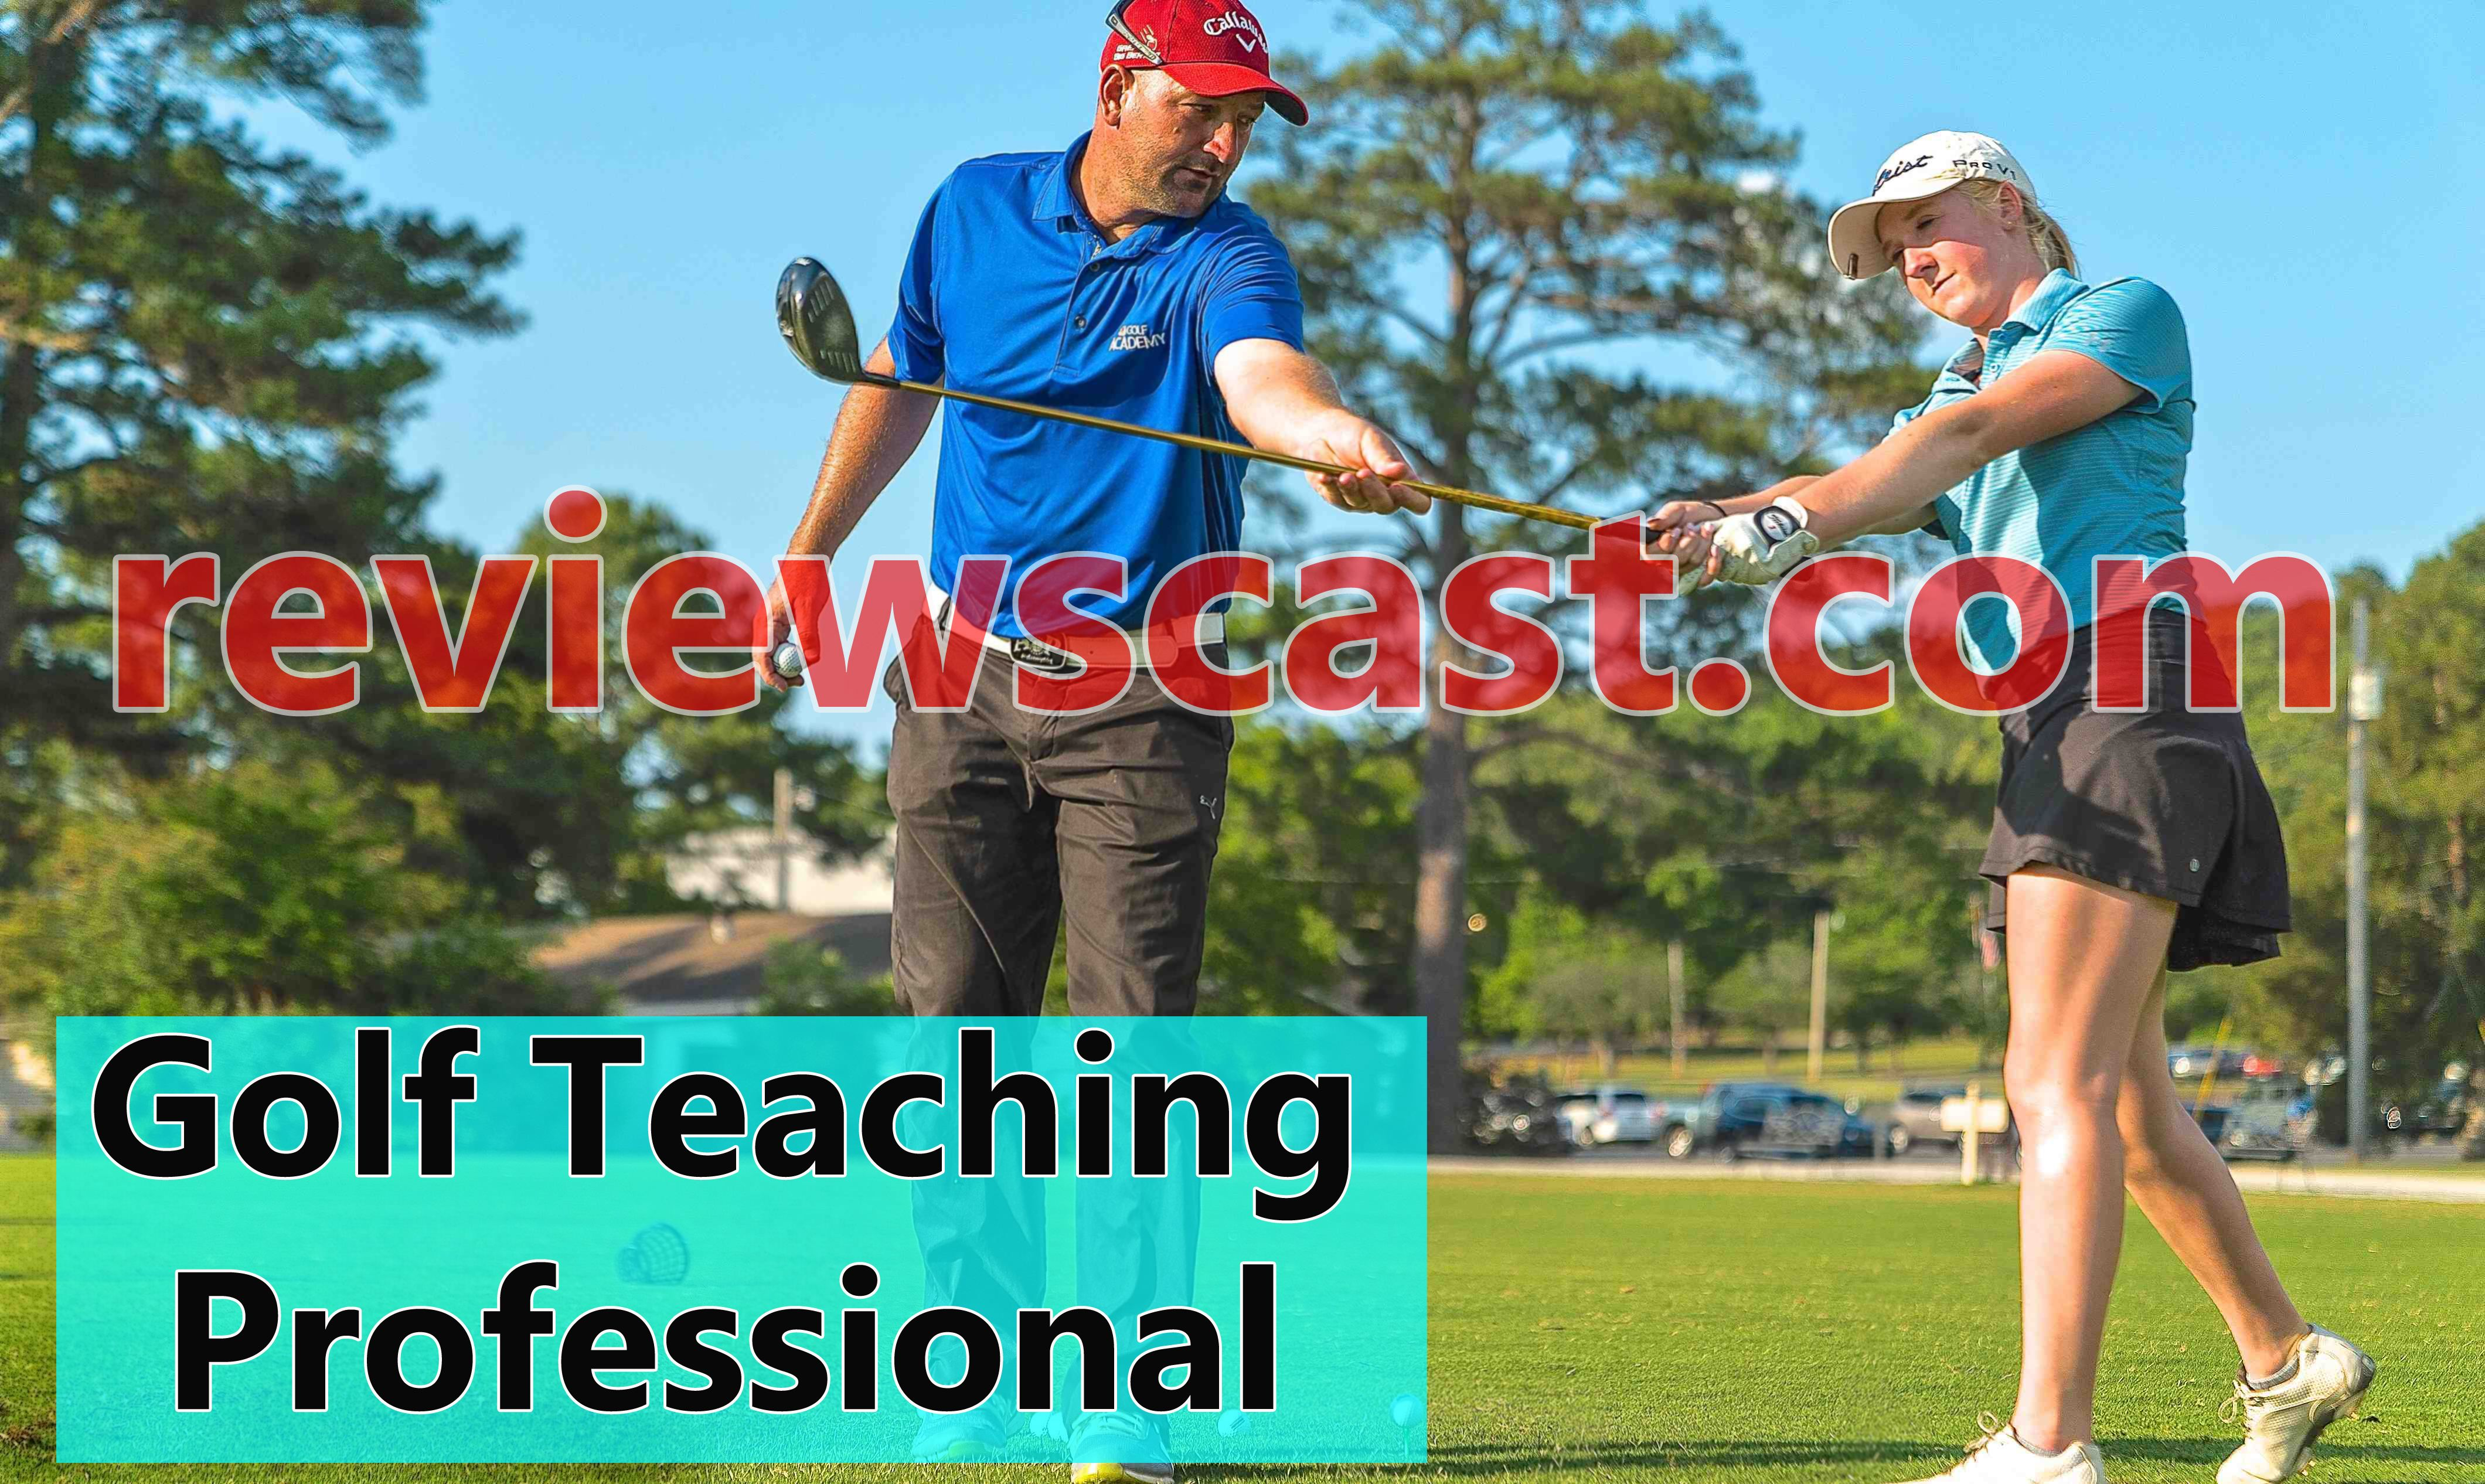 Golf teaching professional golfteachingprofessional